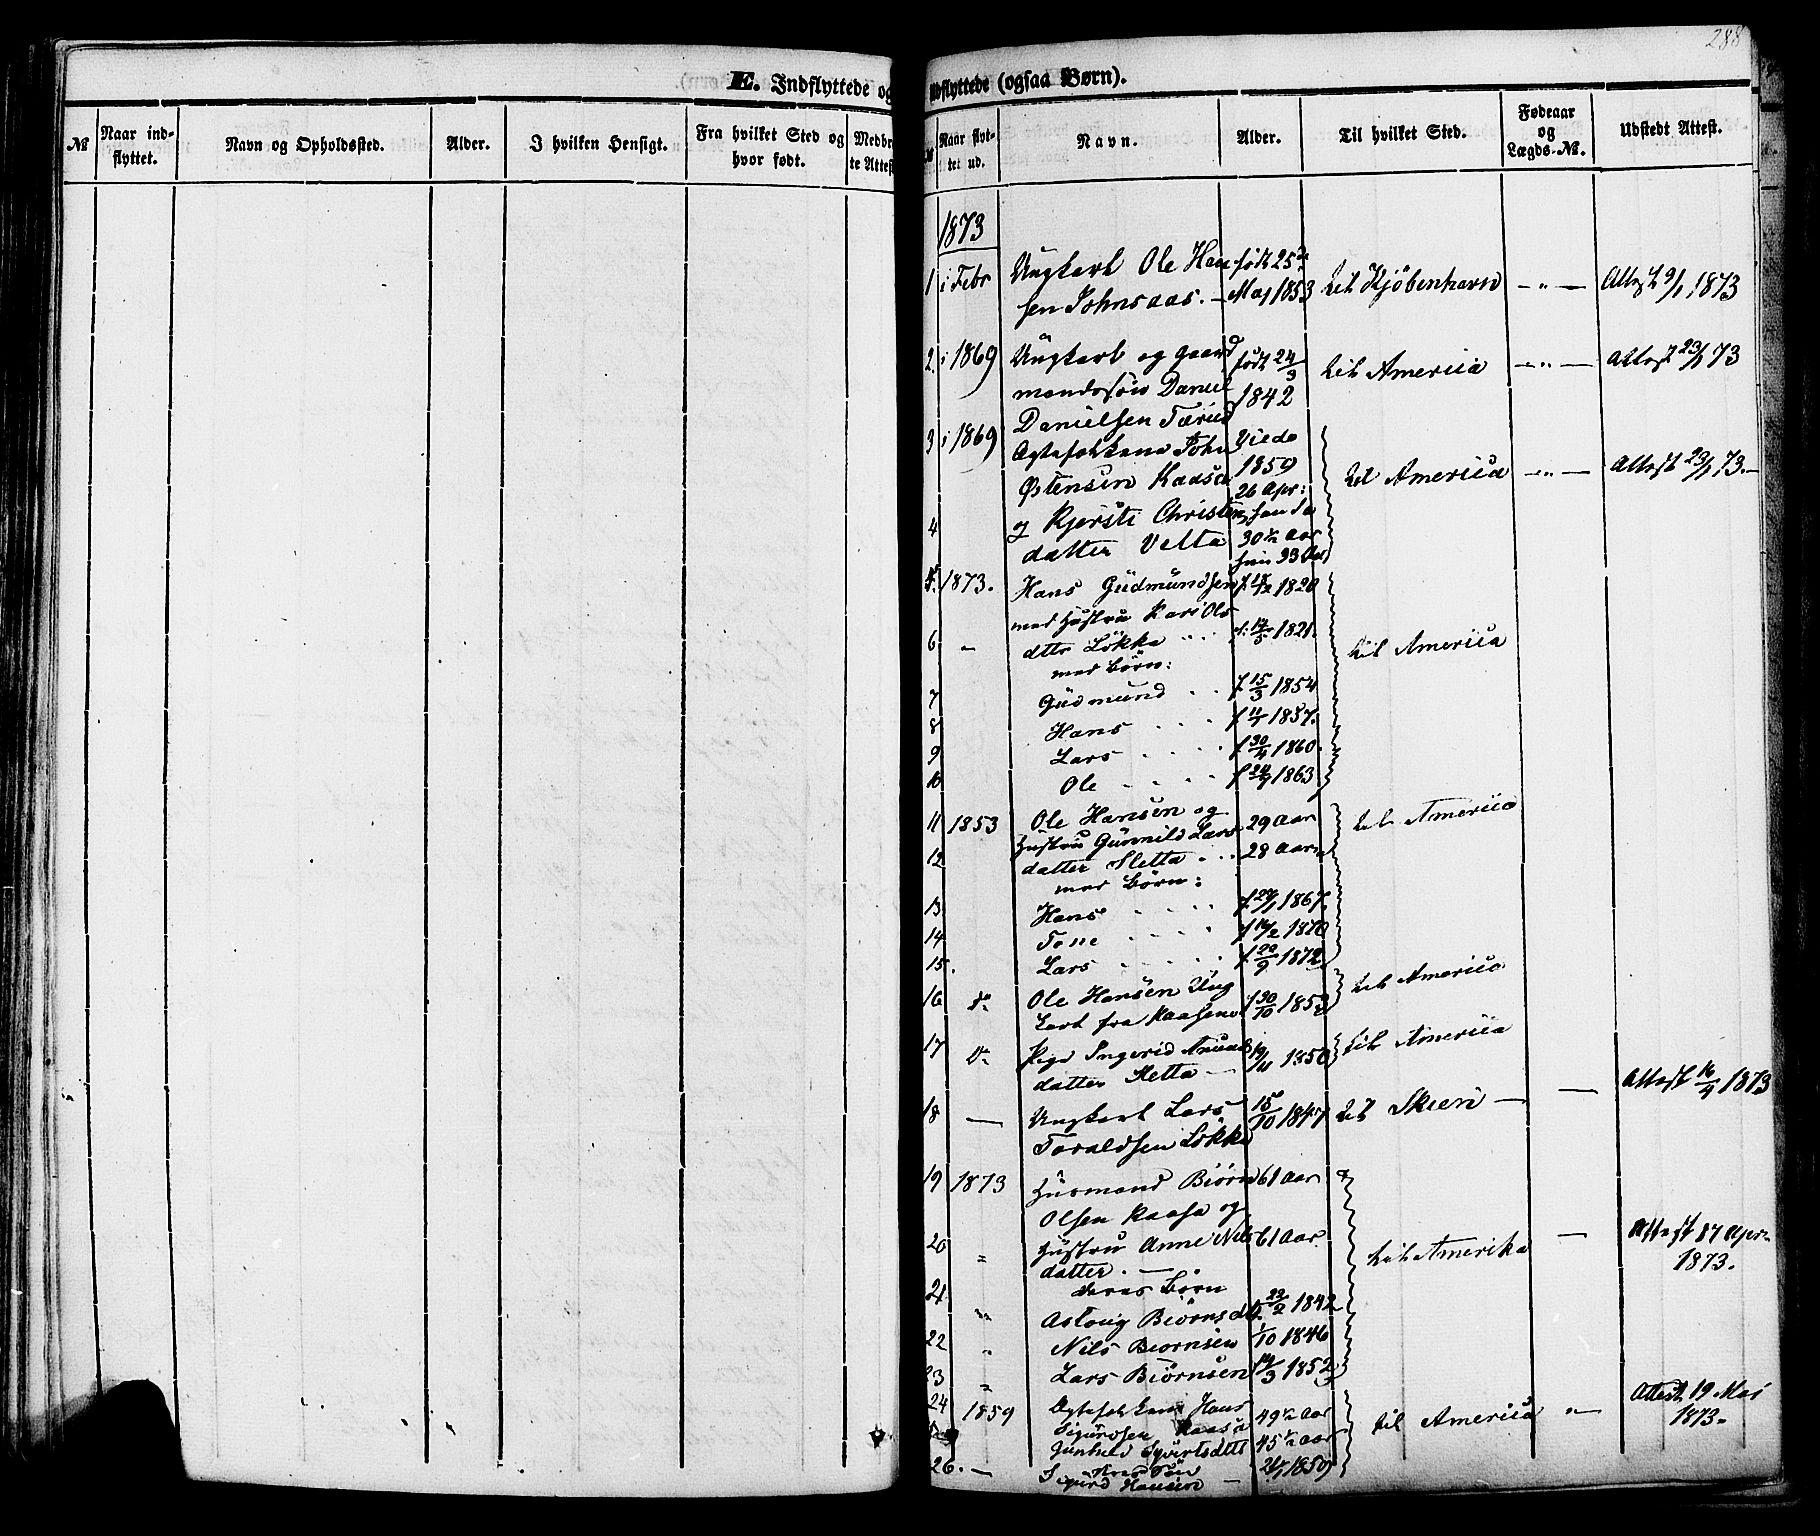 SAKO, Sauherad kirkebøker, F/Fa/L0007: Ministerialbok nr. I 7, 1851-1873, s. 288